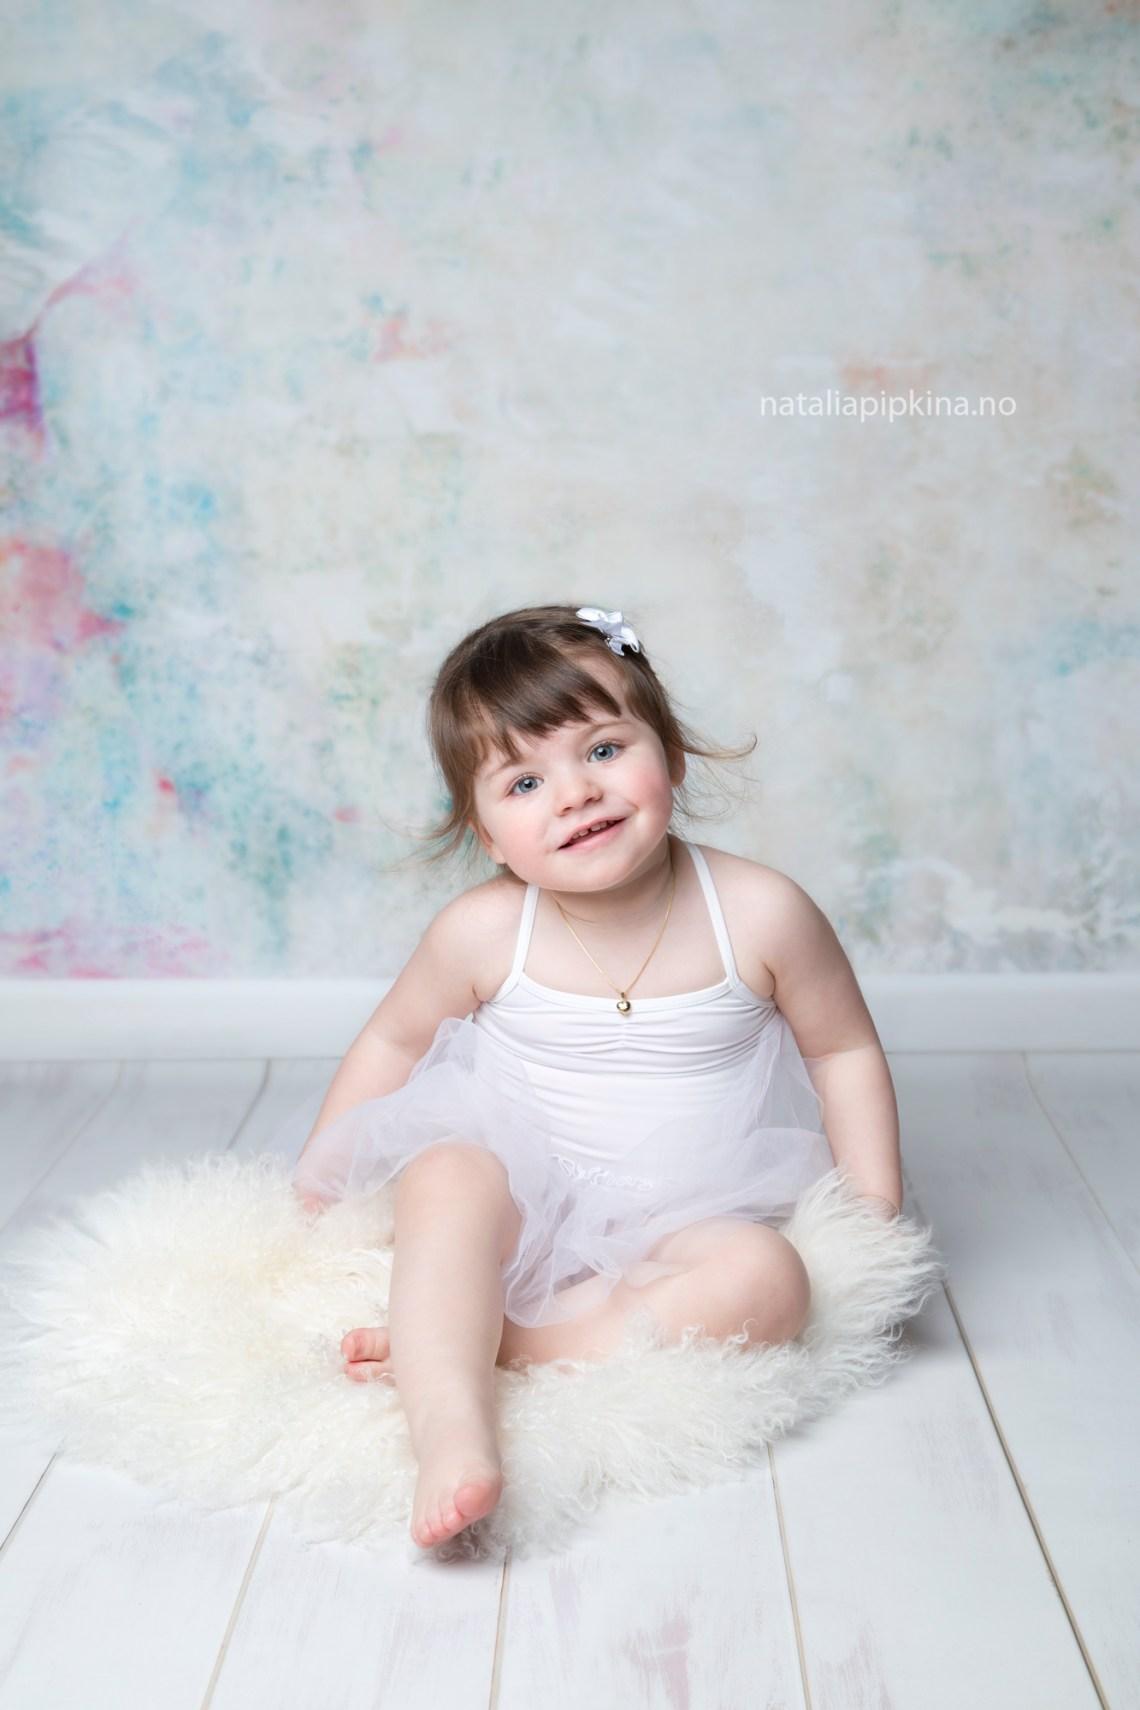 barnebilder-familiefotografering-babyfotografering-barnefotografering-oslo-fotograf-oppegaard-familiebilder-oslo-barn-foreldreogbarn